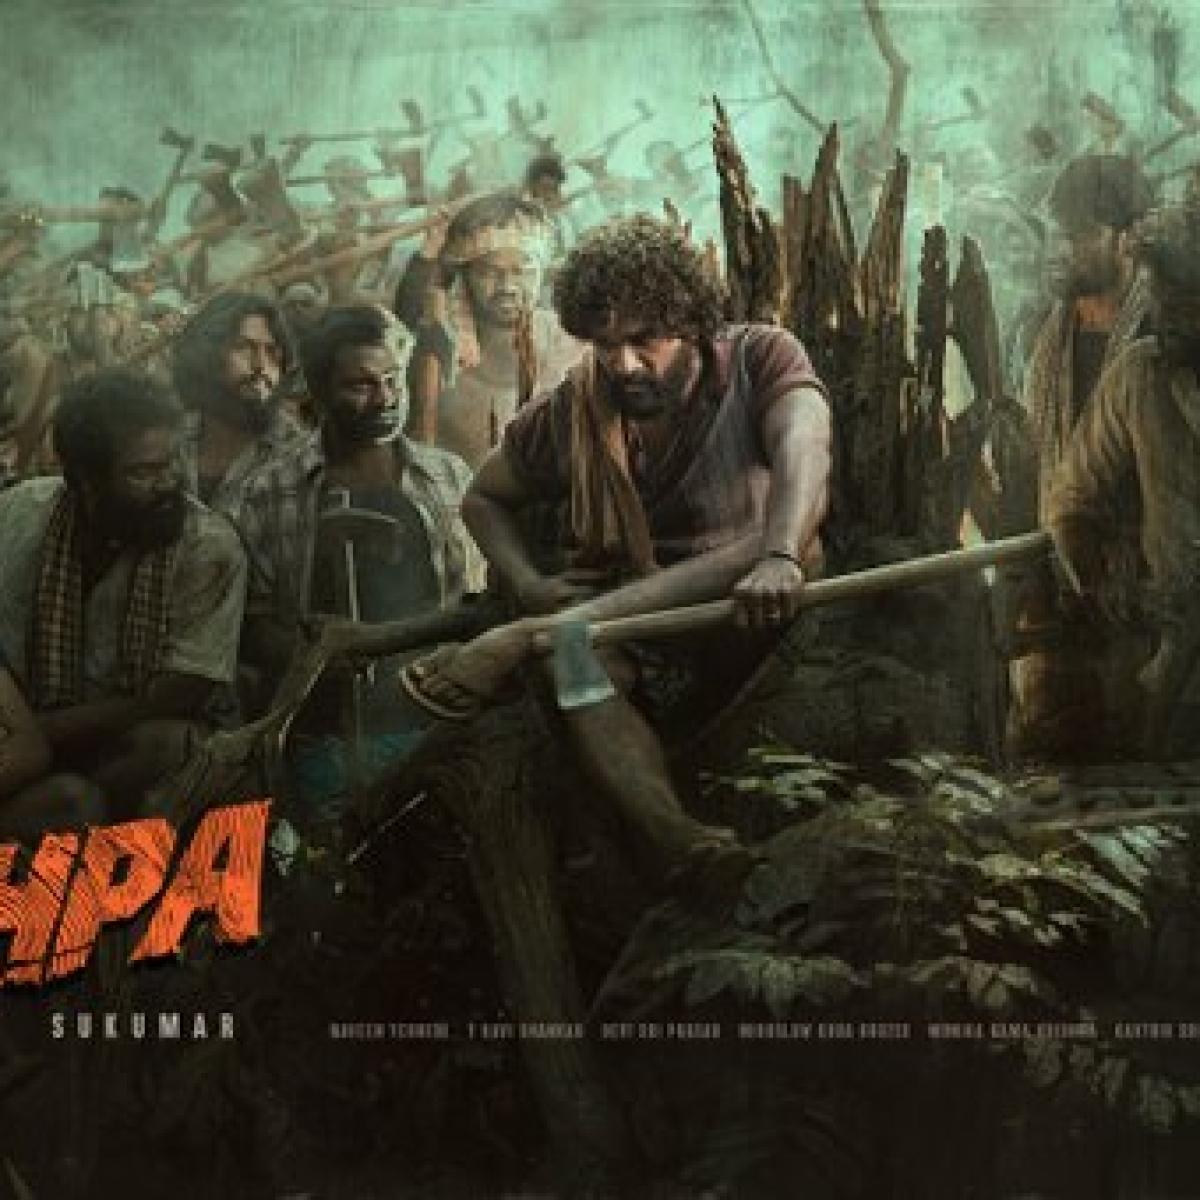 Allu Arjun looks unrecognizable in upcoming action thriller 'Pushpa'